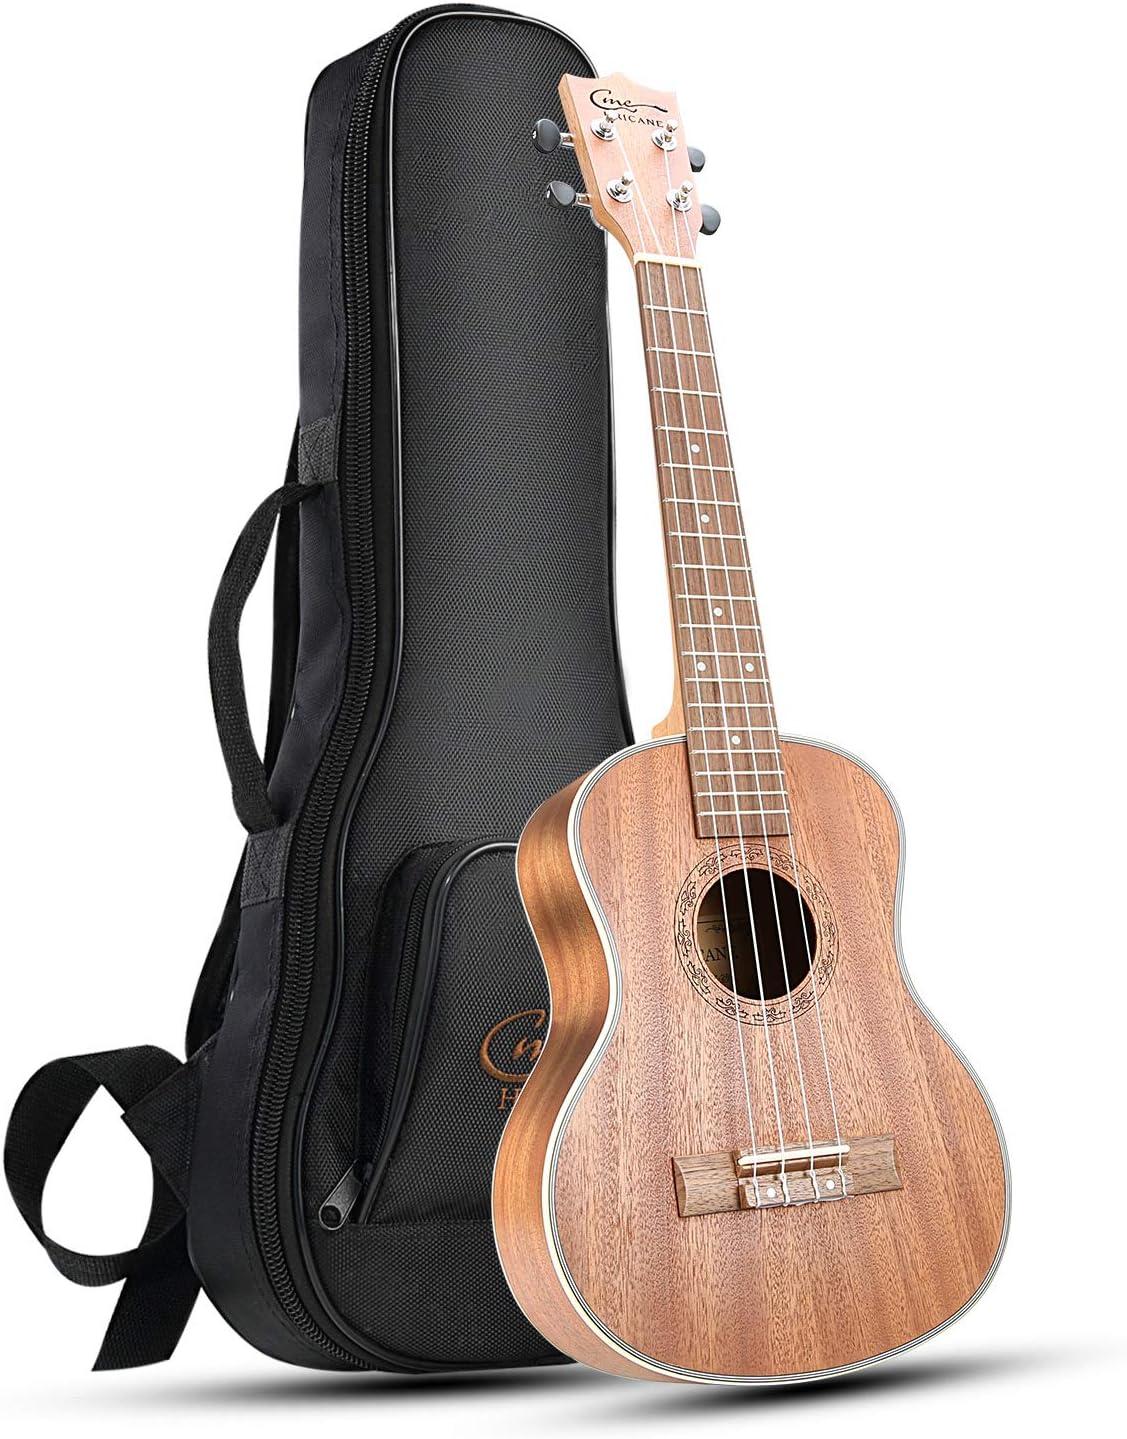 Hricane Tenor Ukulele UKS-3 26inch Professional Ukulele Starter Small Guitar Hawaiian Guitar Bundle with Gig Bag